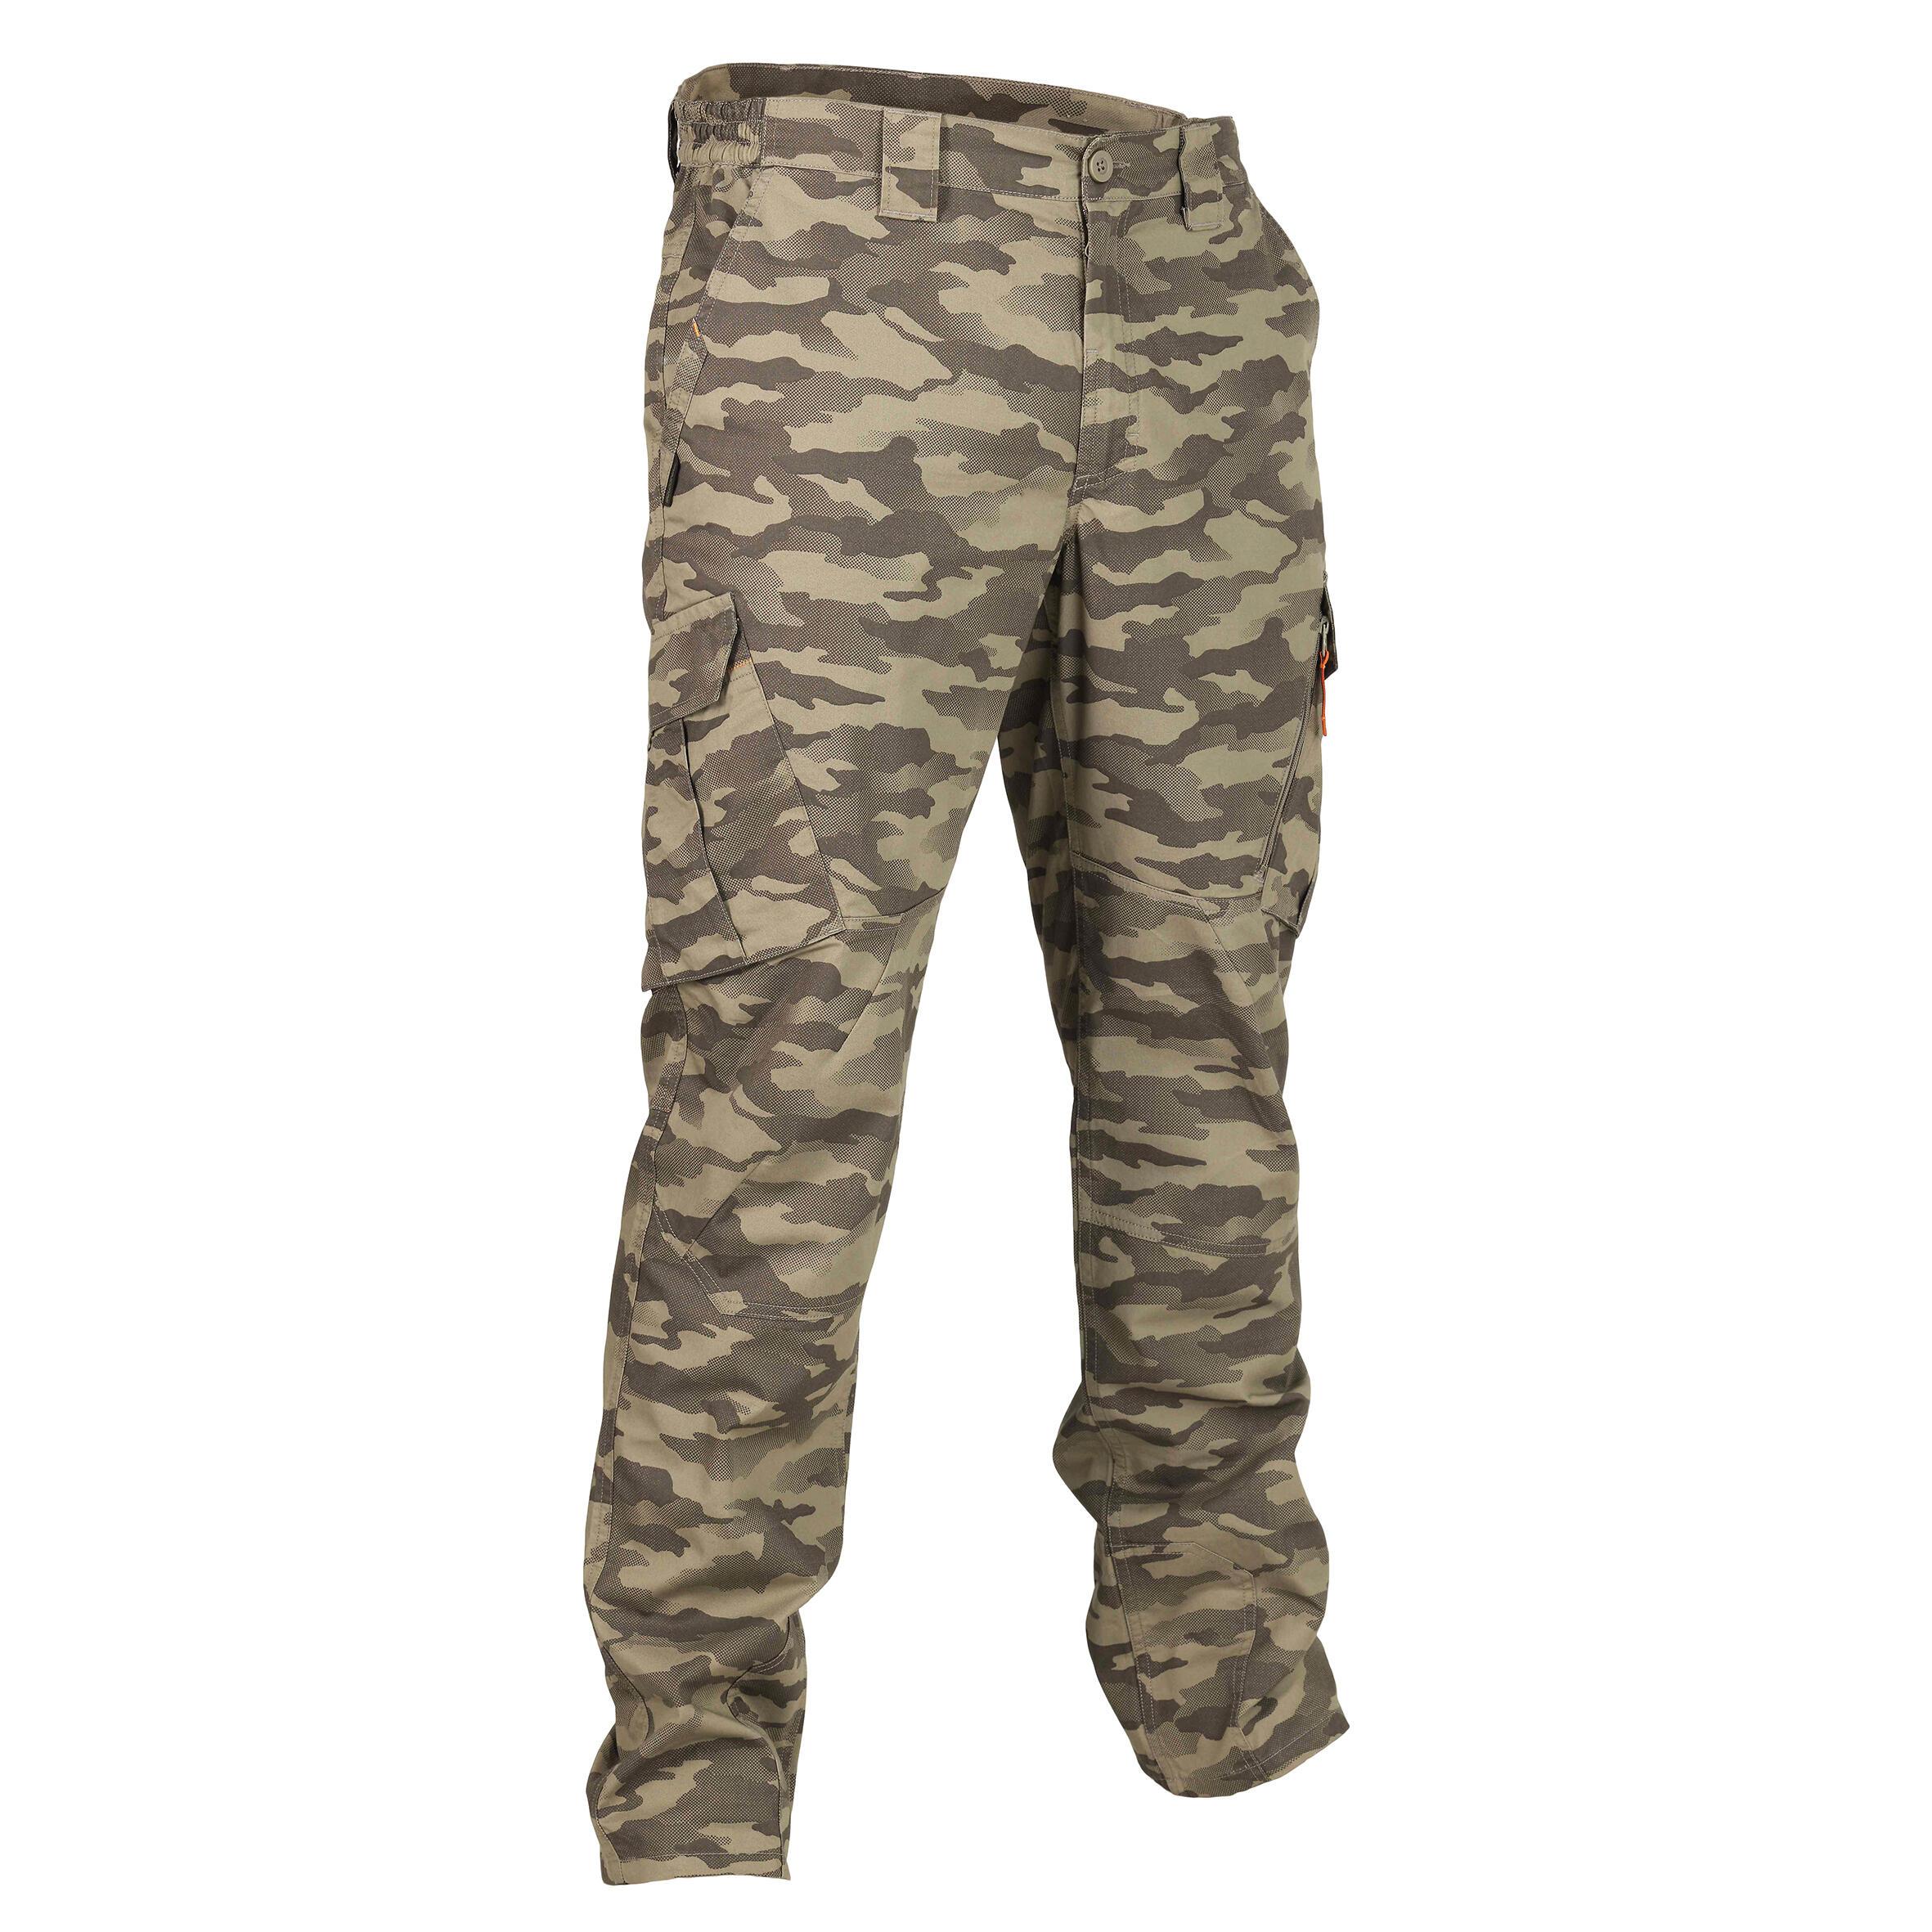 SG500 trousers KHK